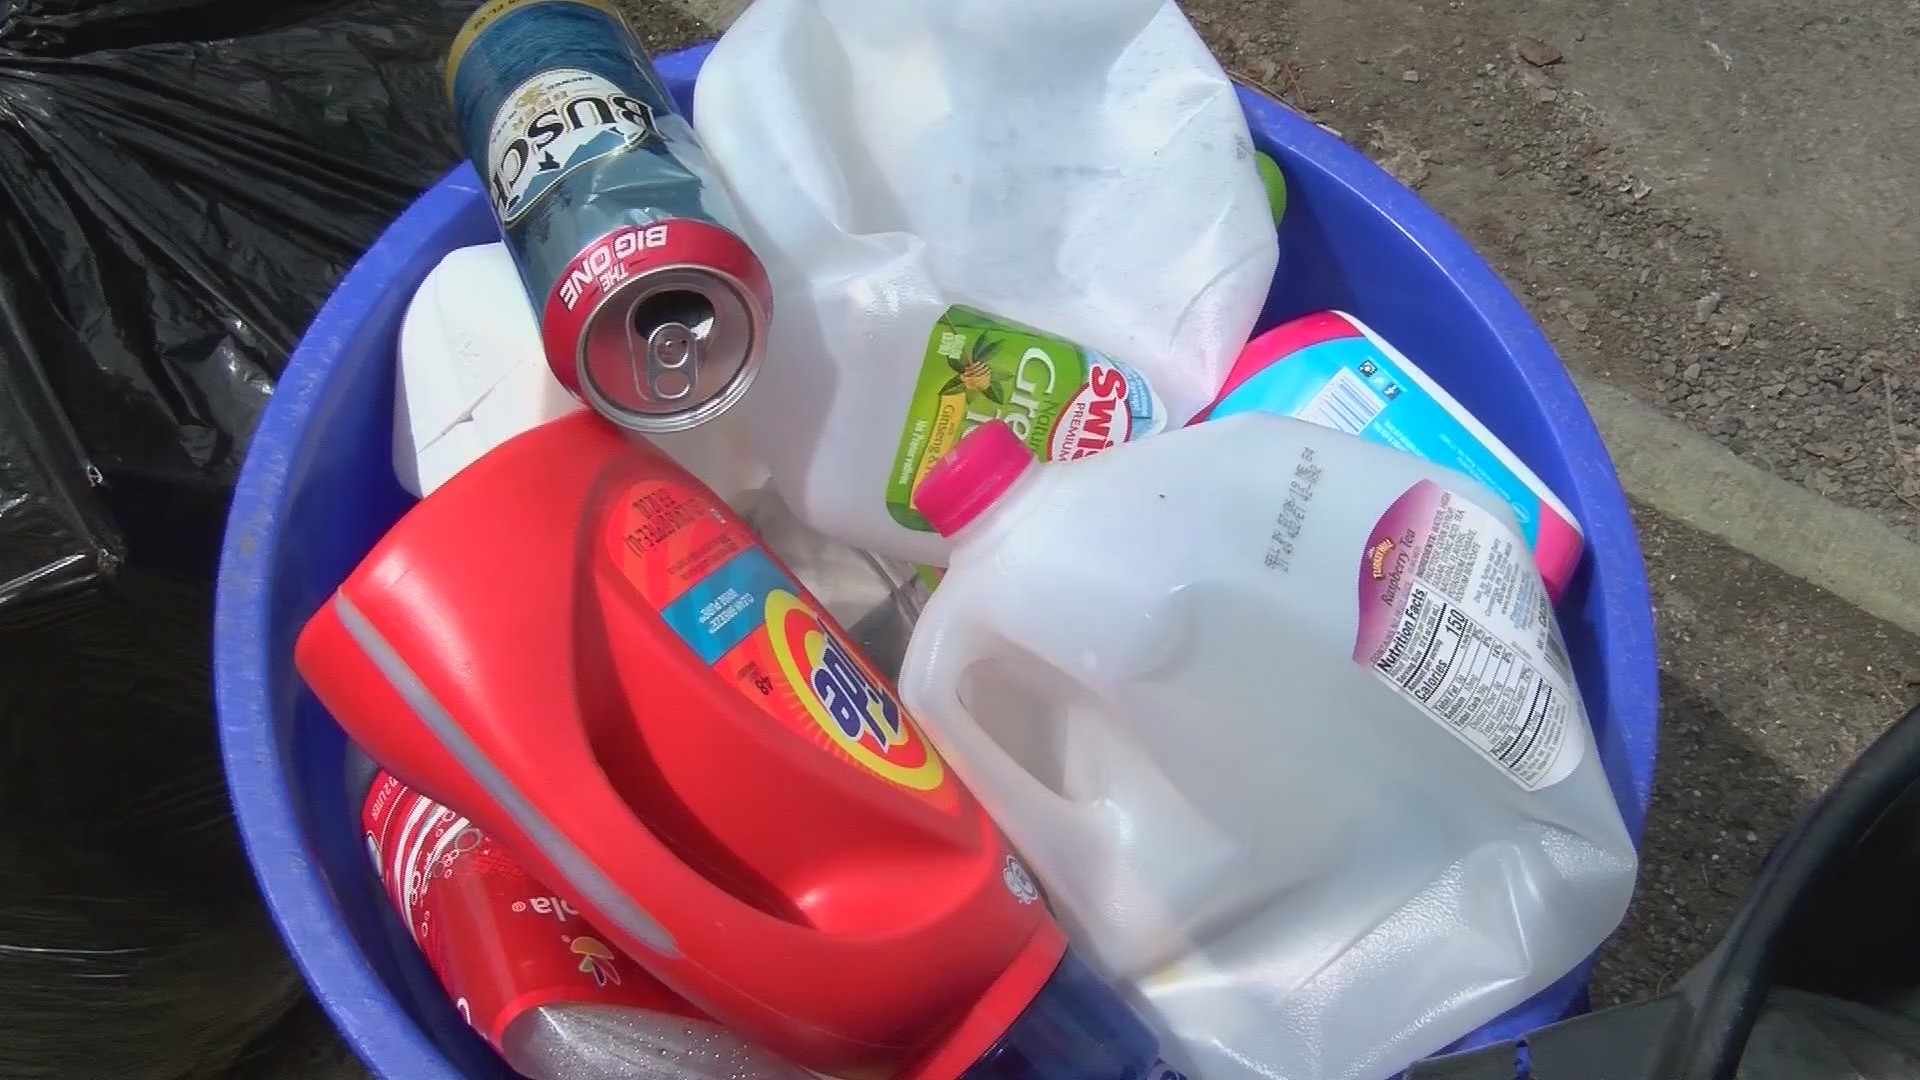 Lackawanna_County_recycling_assortment_a_0_20190422220858